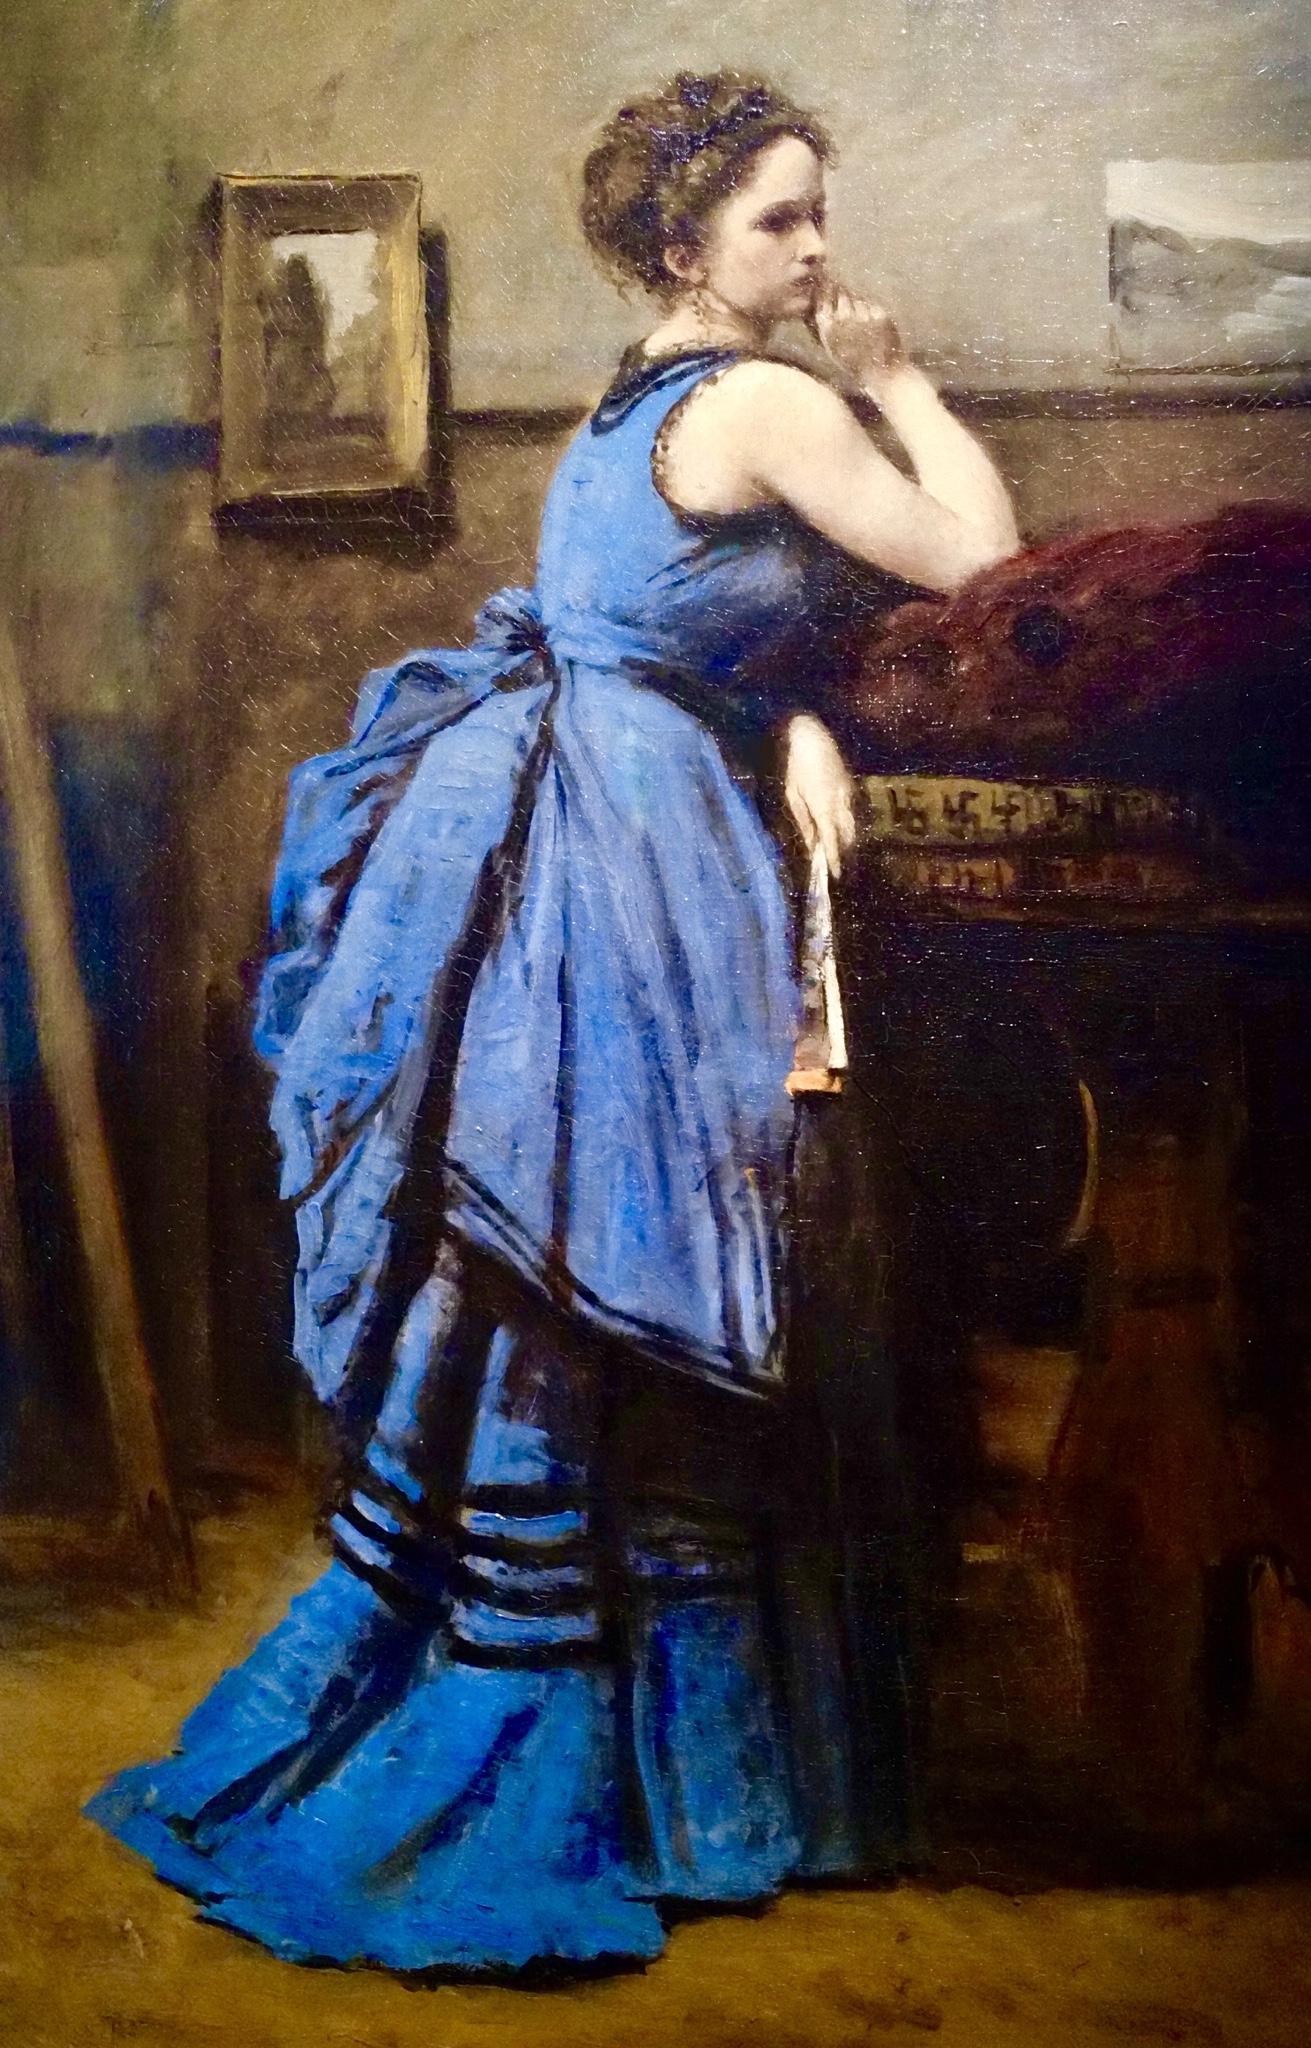 La dama in blu 1874